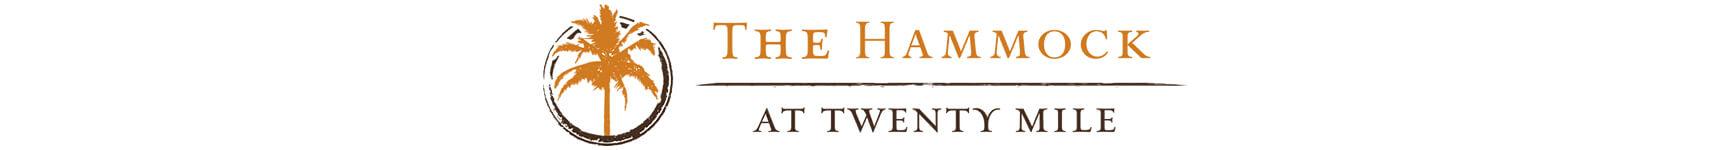 The-Hammock-banner.jpg